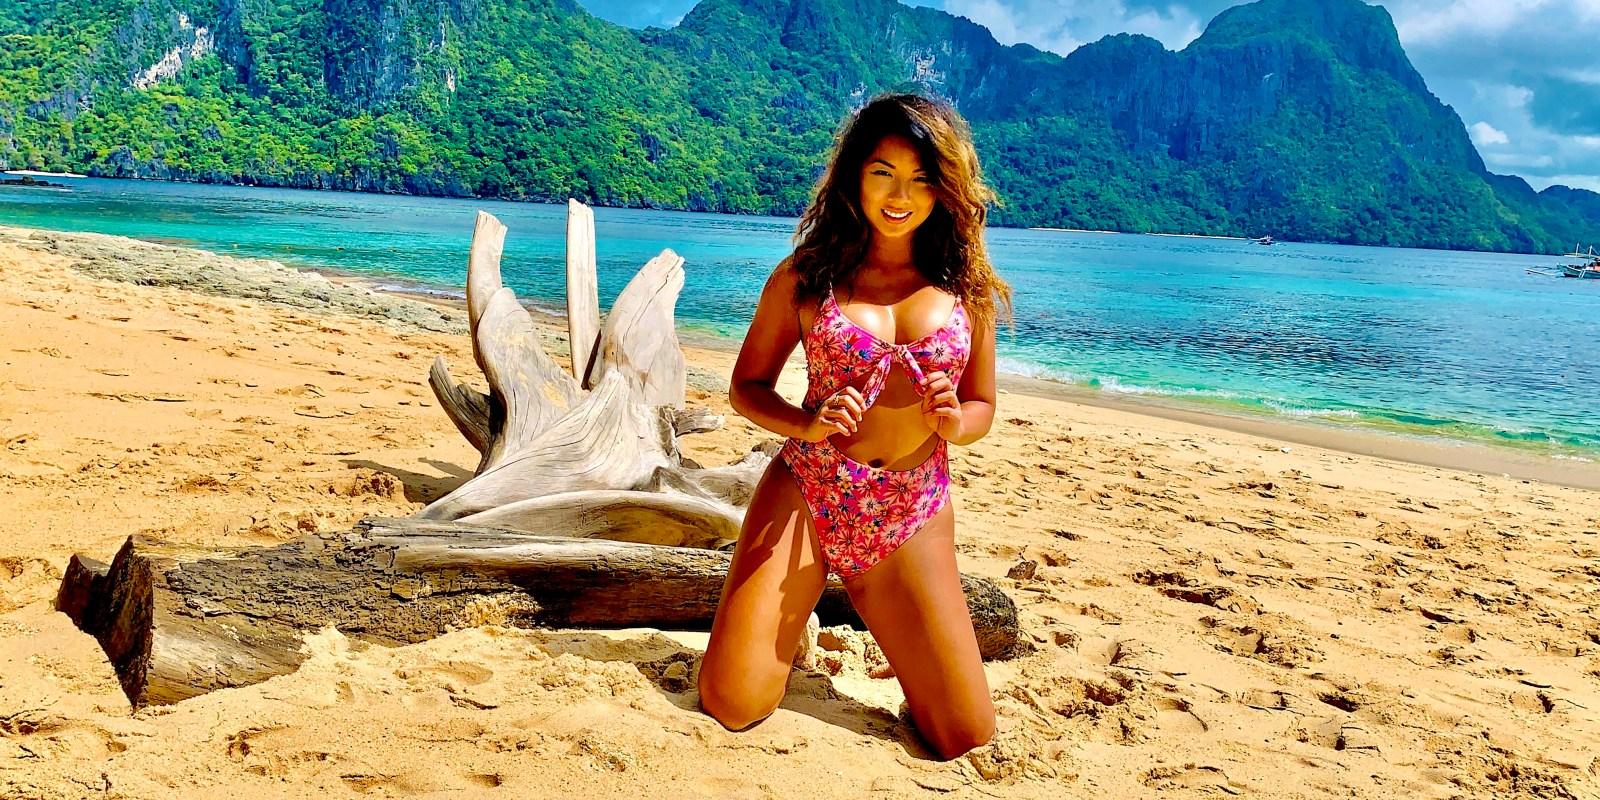 jenny chu in front of drift wood secret beach hidden beach matinloc shrine star beach helicopter island el nido philippines